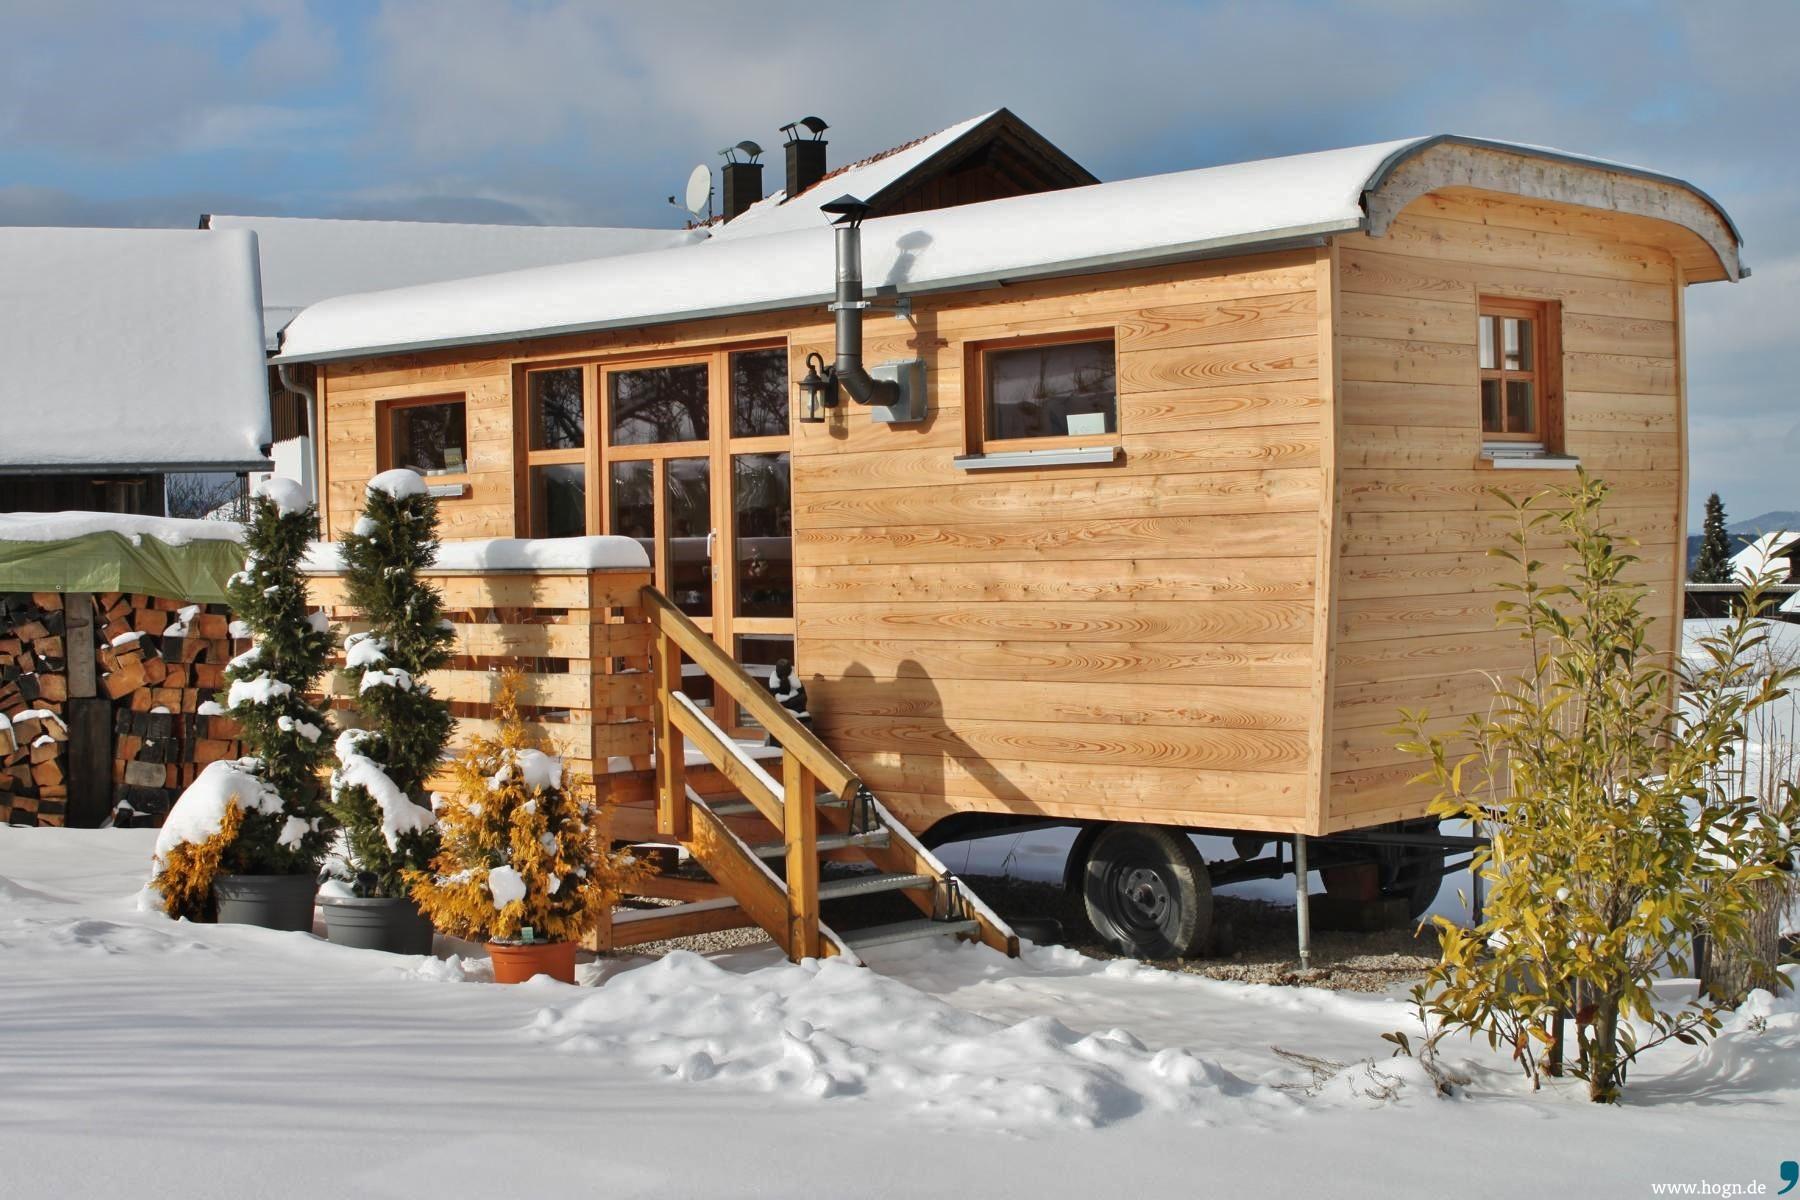 chalet forsthaus wartner arnetsried bayerischer wald 217. Black Bedroom Furniture Sets. Home Design Ideas